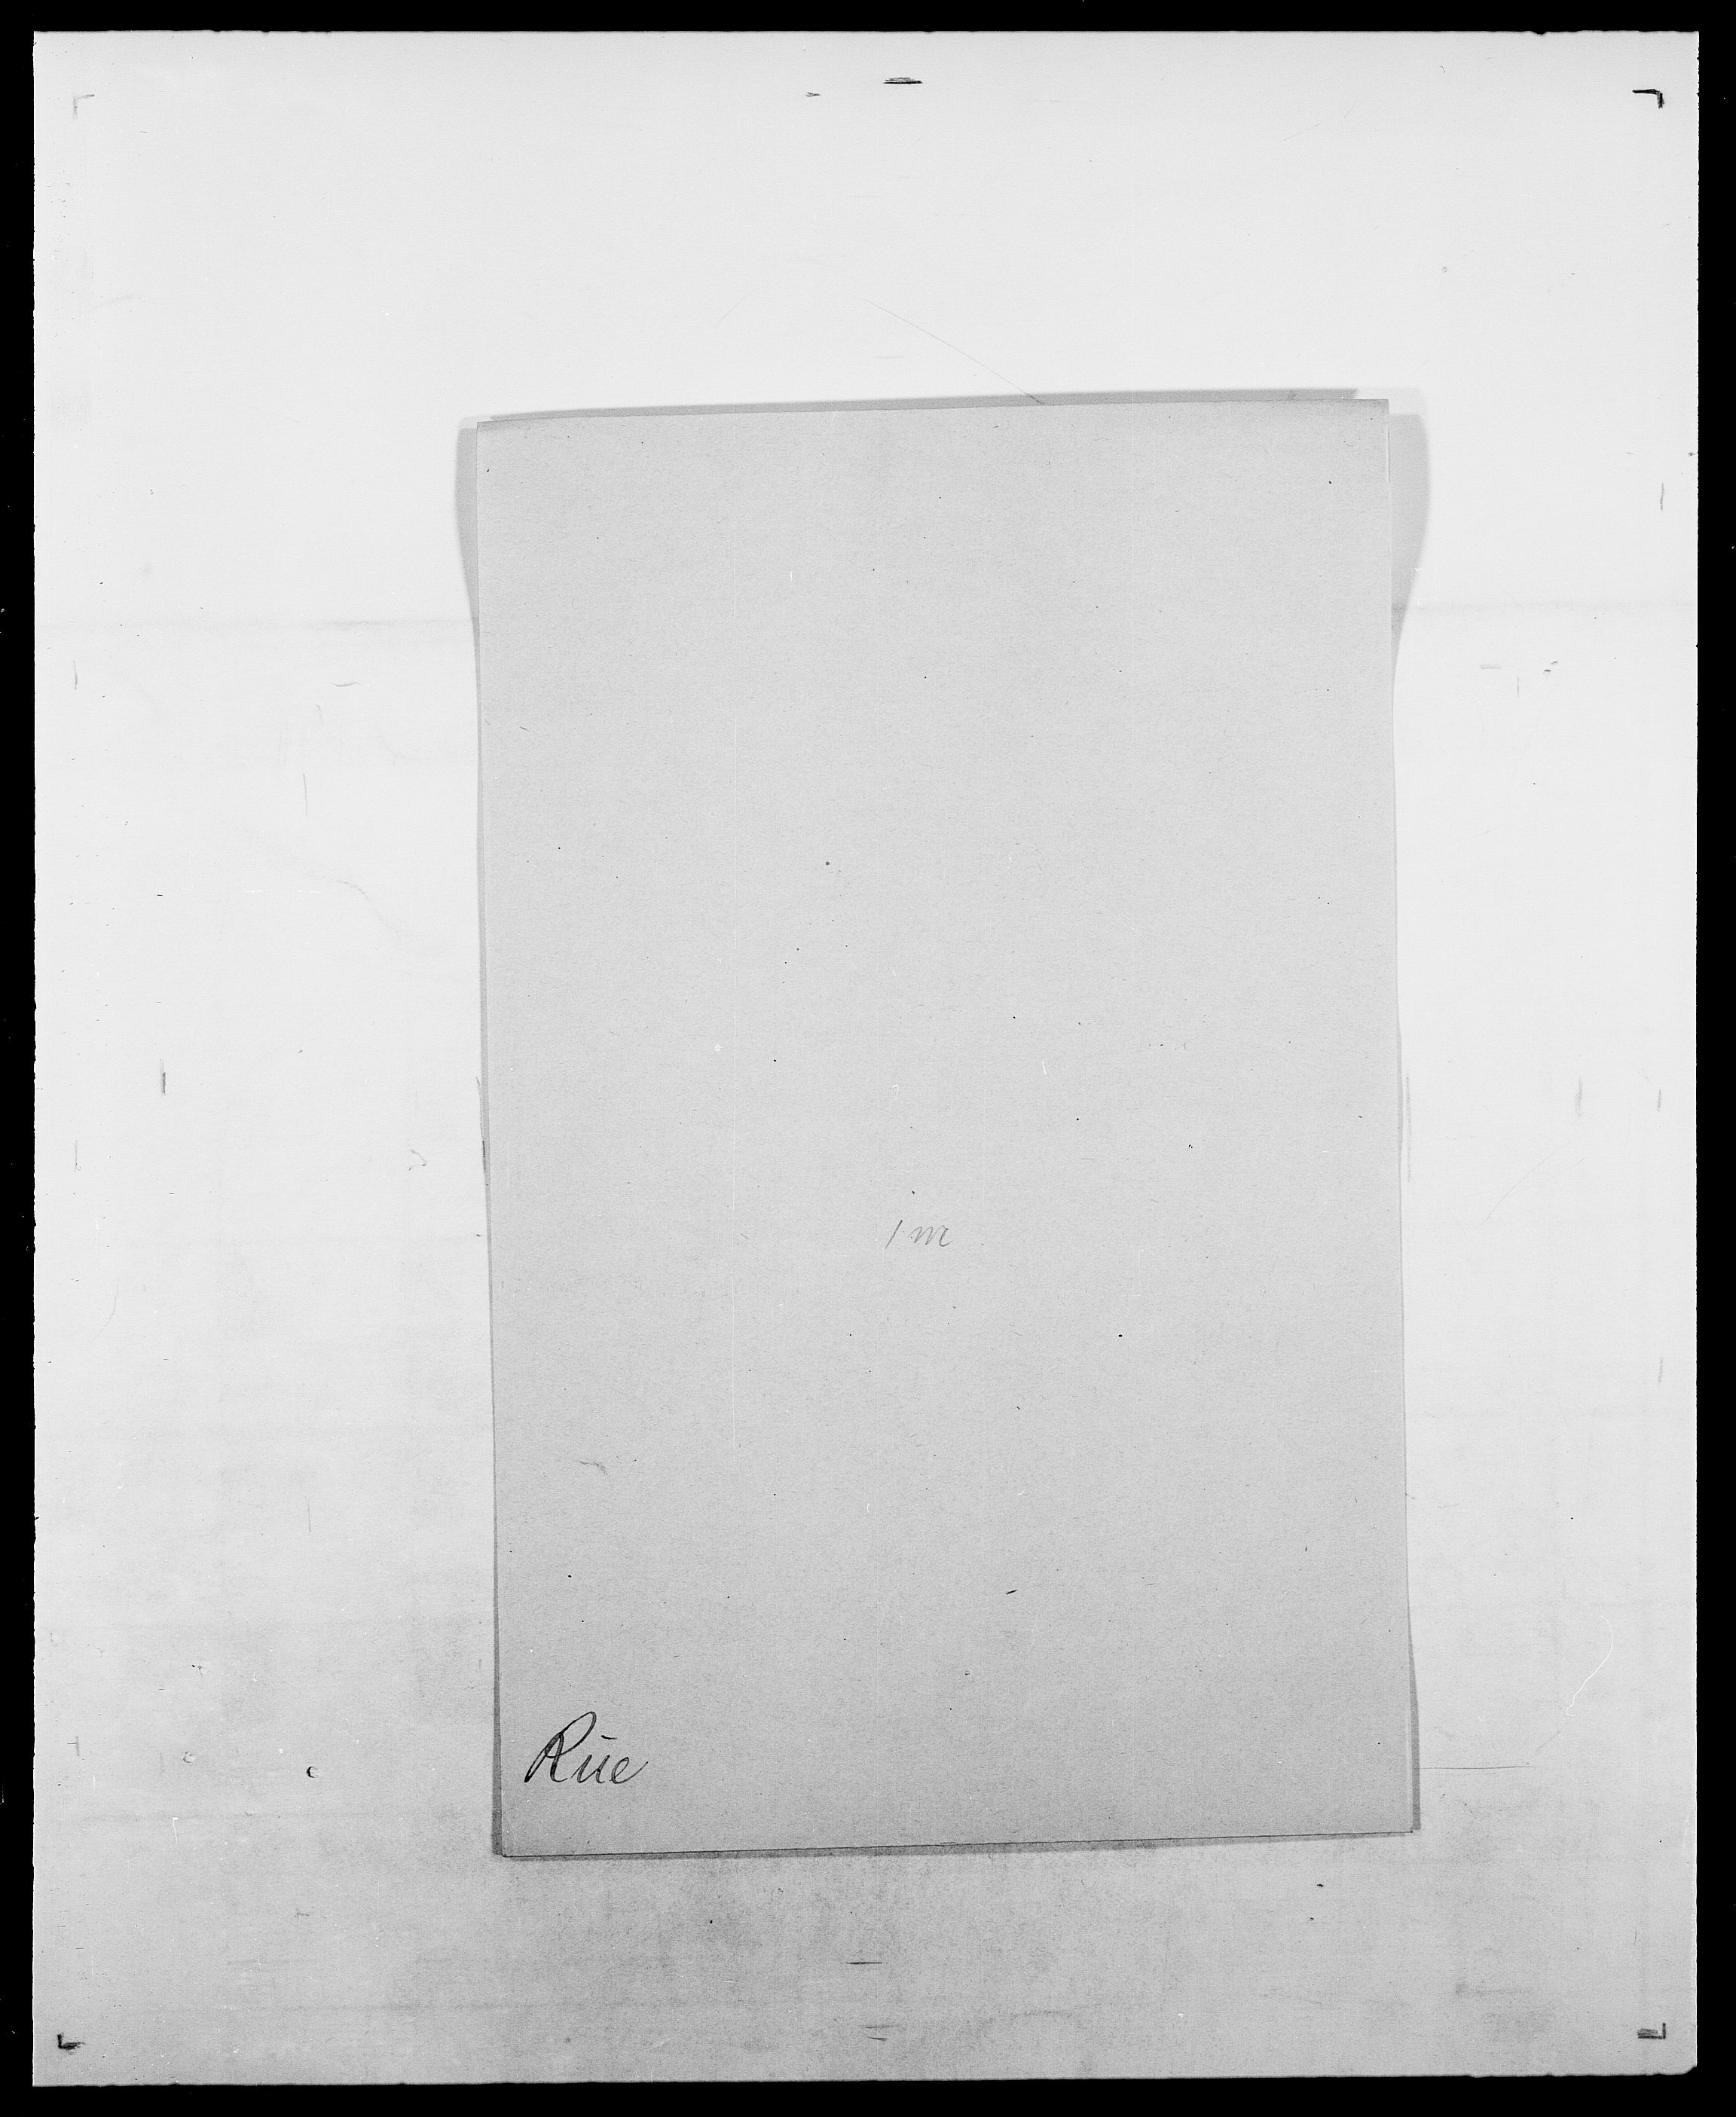 SAO, Delgobe, Charles Antoine - samling, D/Da/L0033: Roald - Røyem, s. 440